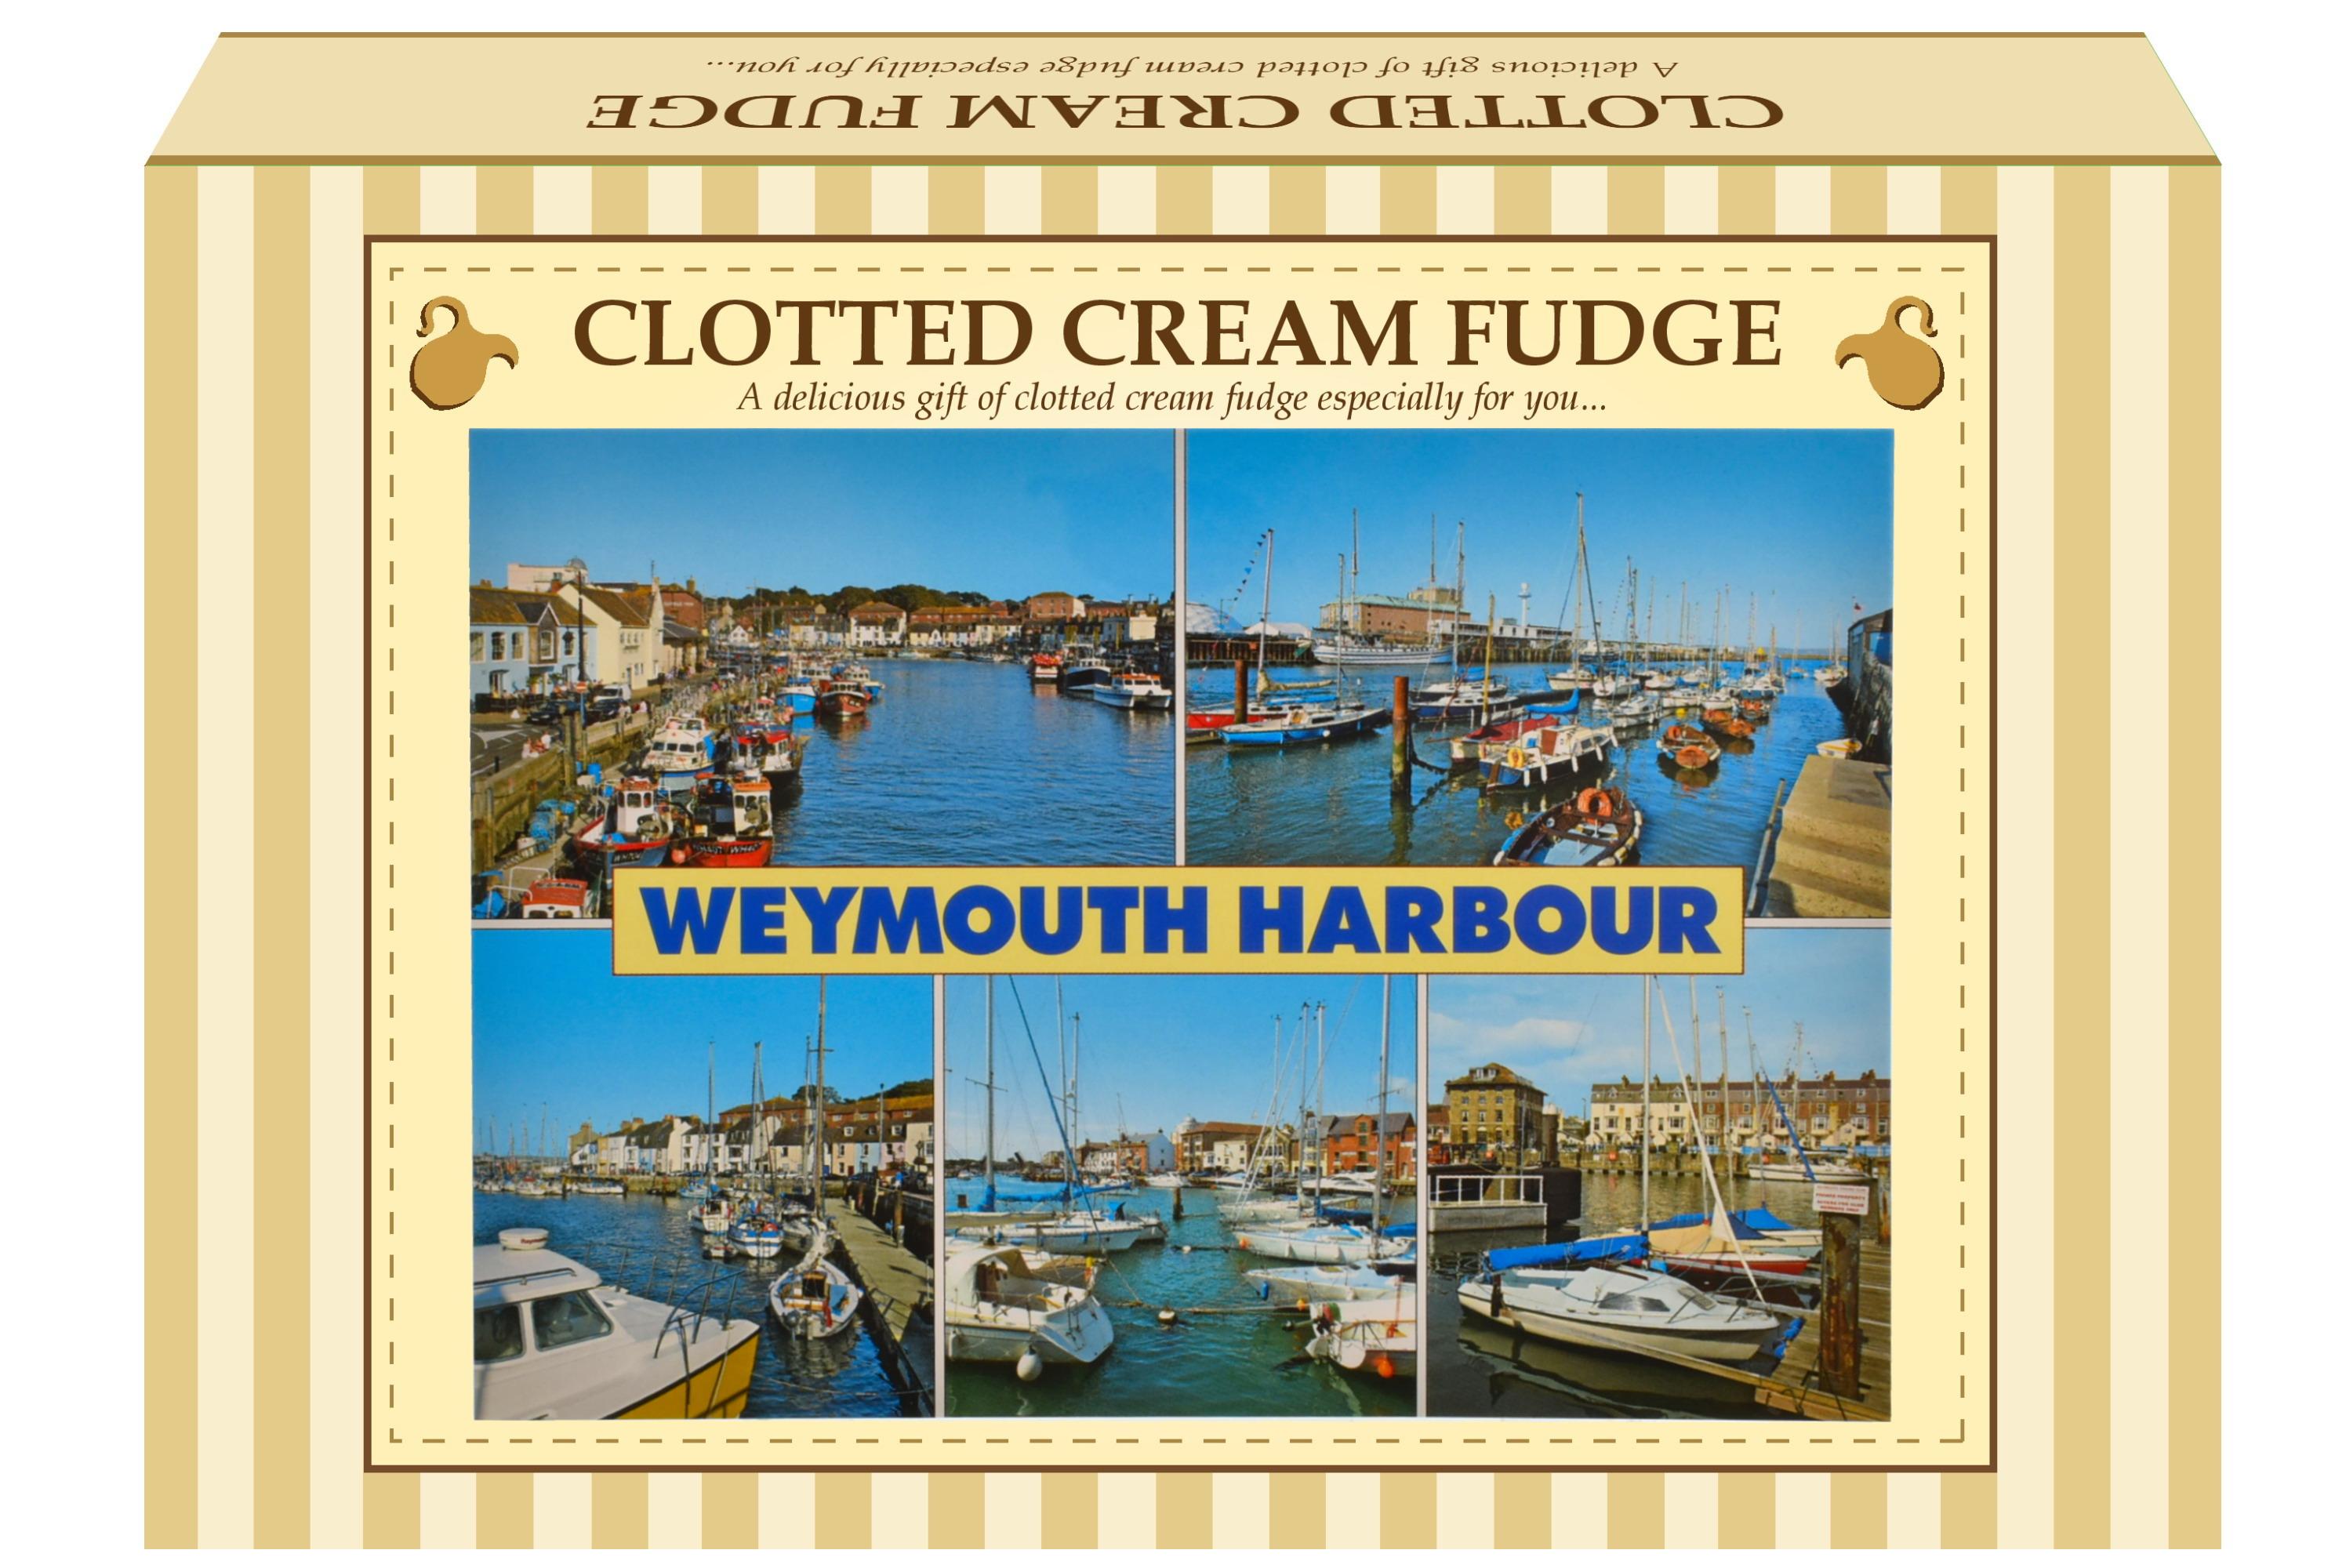 200g Clotted Cream Fudge Postcard Gift Box